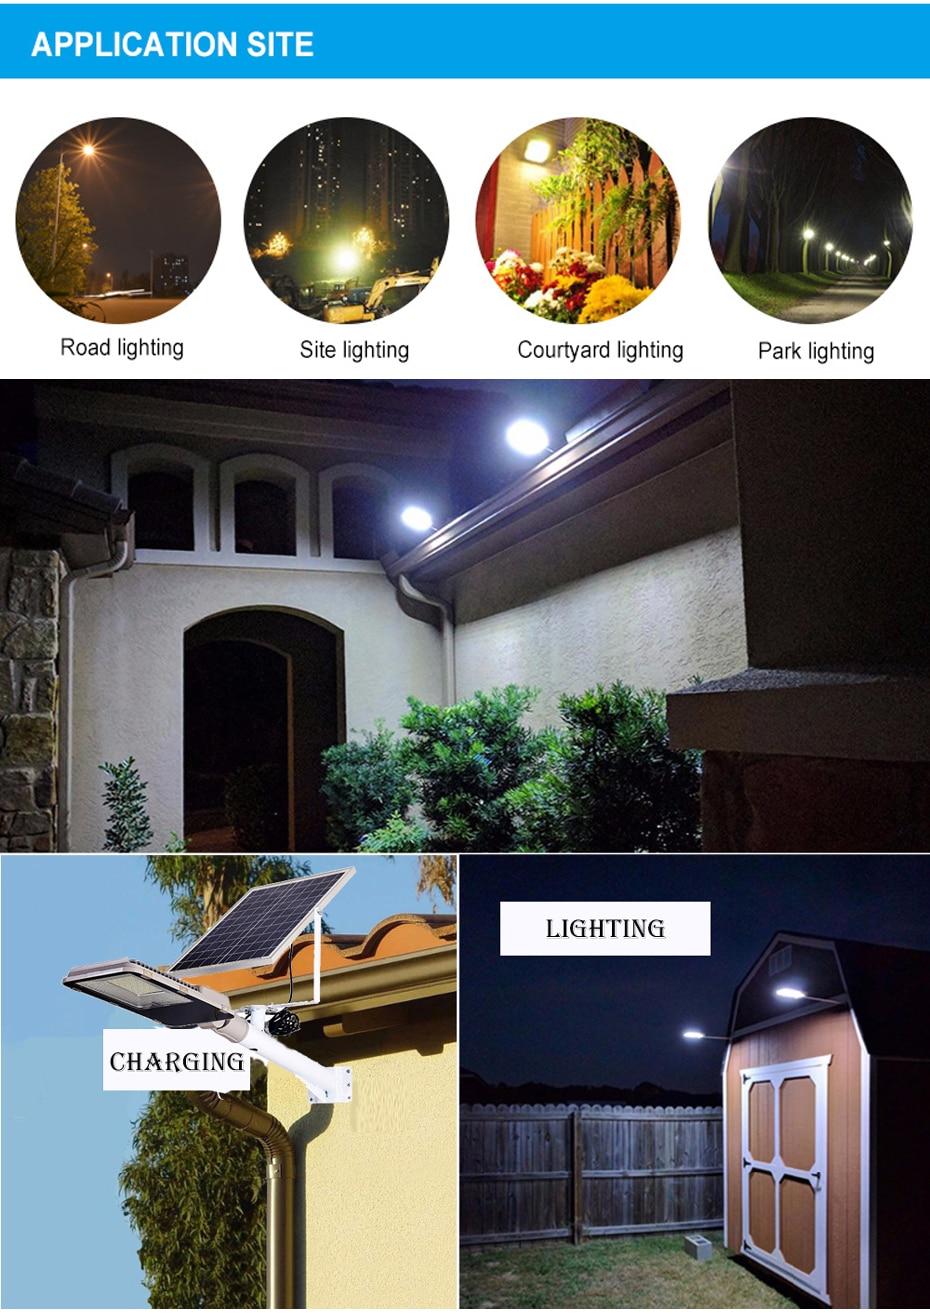 Led 屋外ソーラー街路灯海外倉庫防水大型太陽電池パネルリモコン高輝度 GUGI 街路灯の庭 4